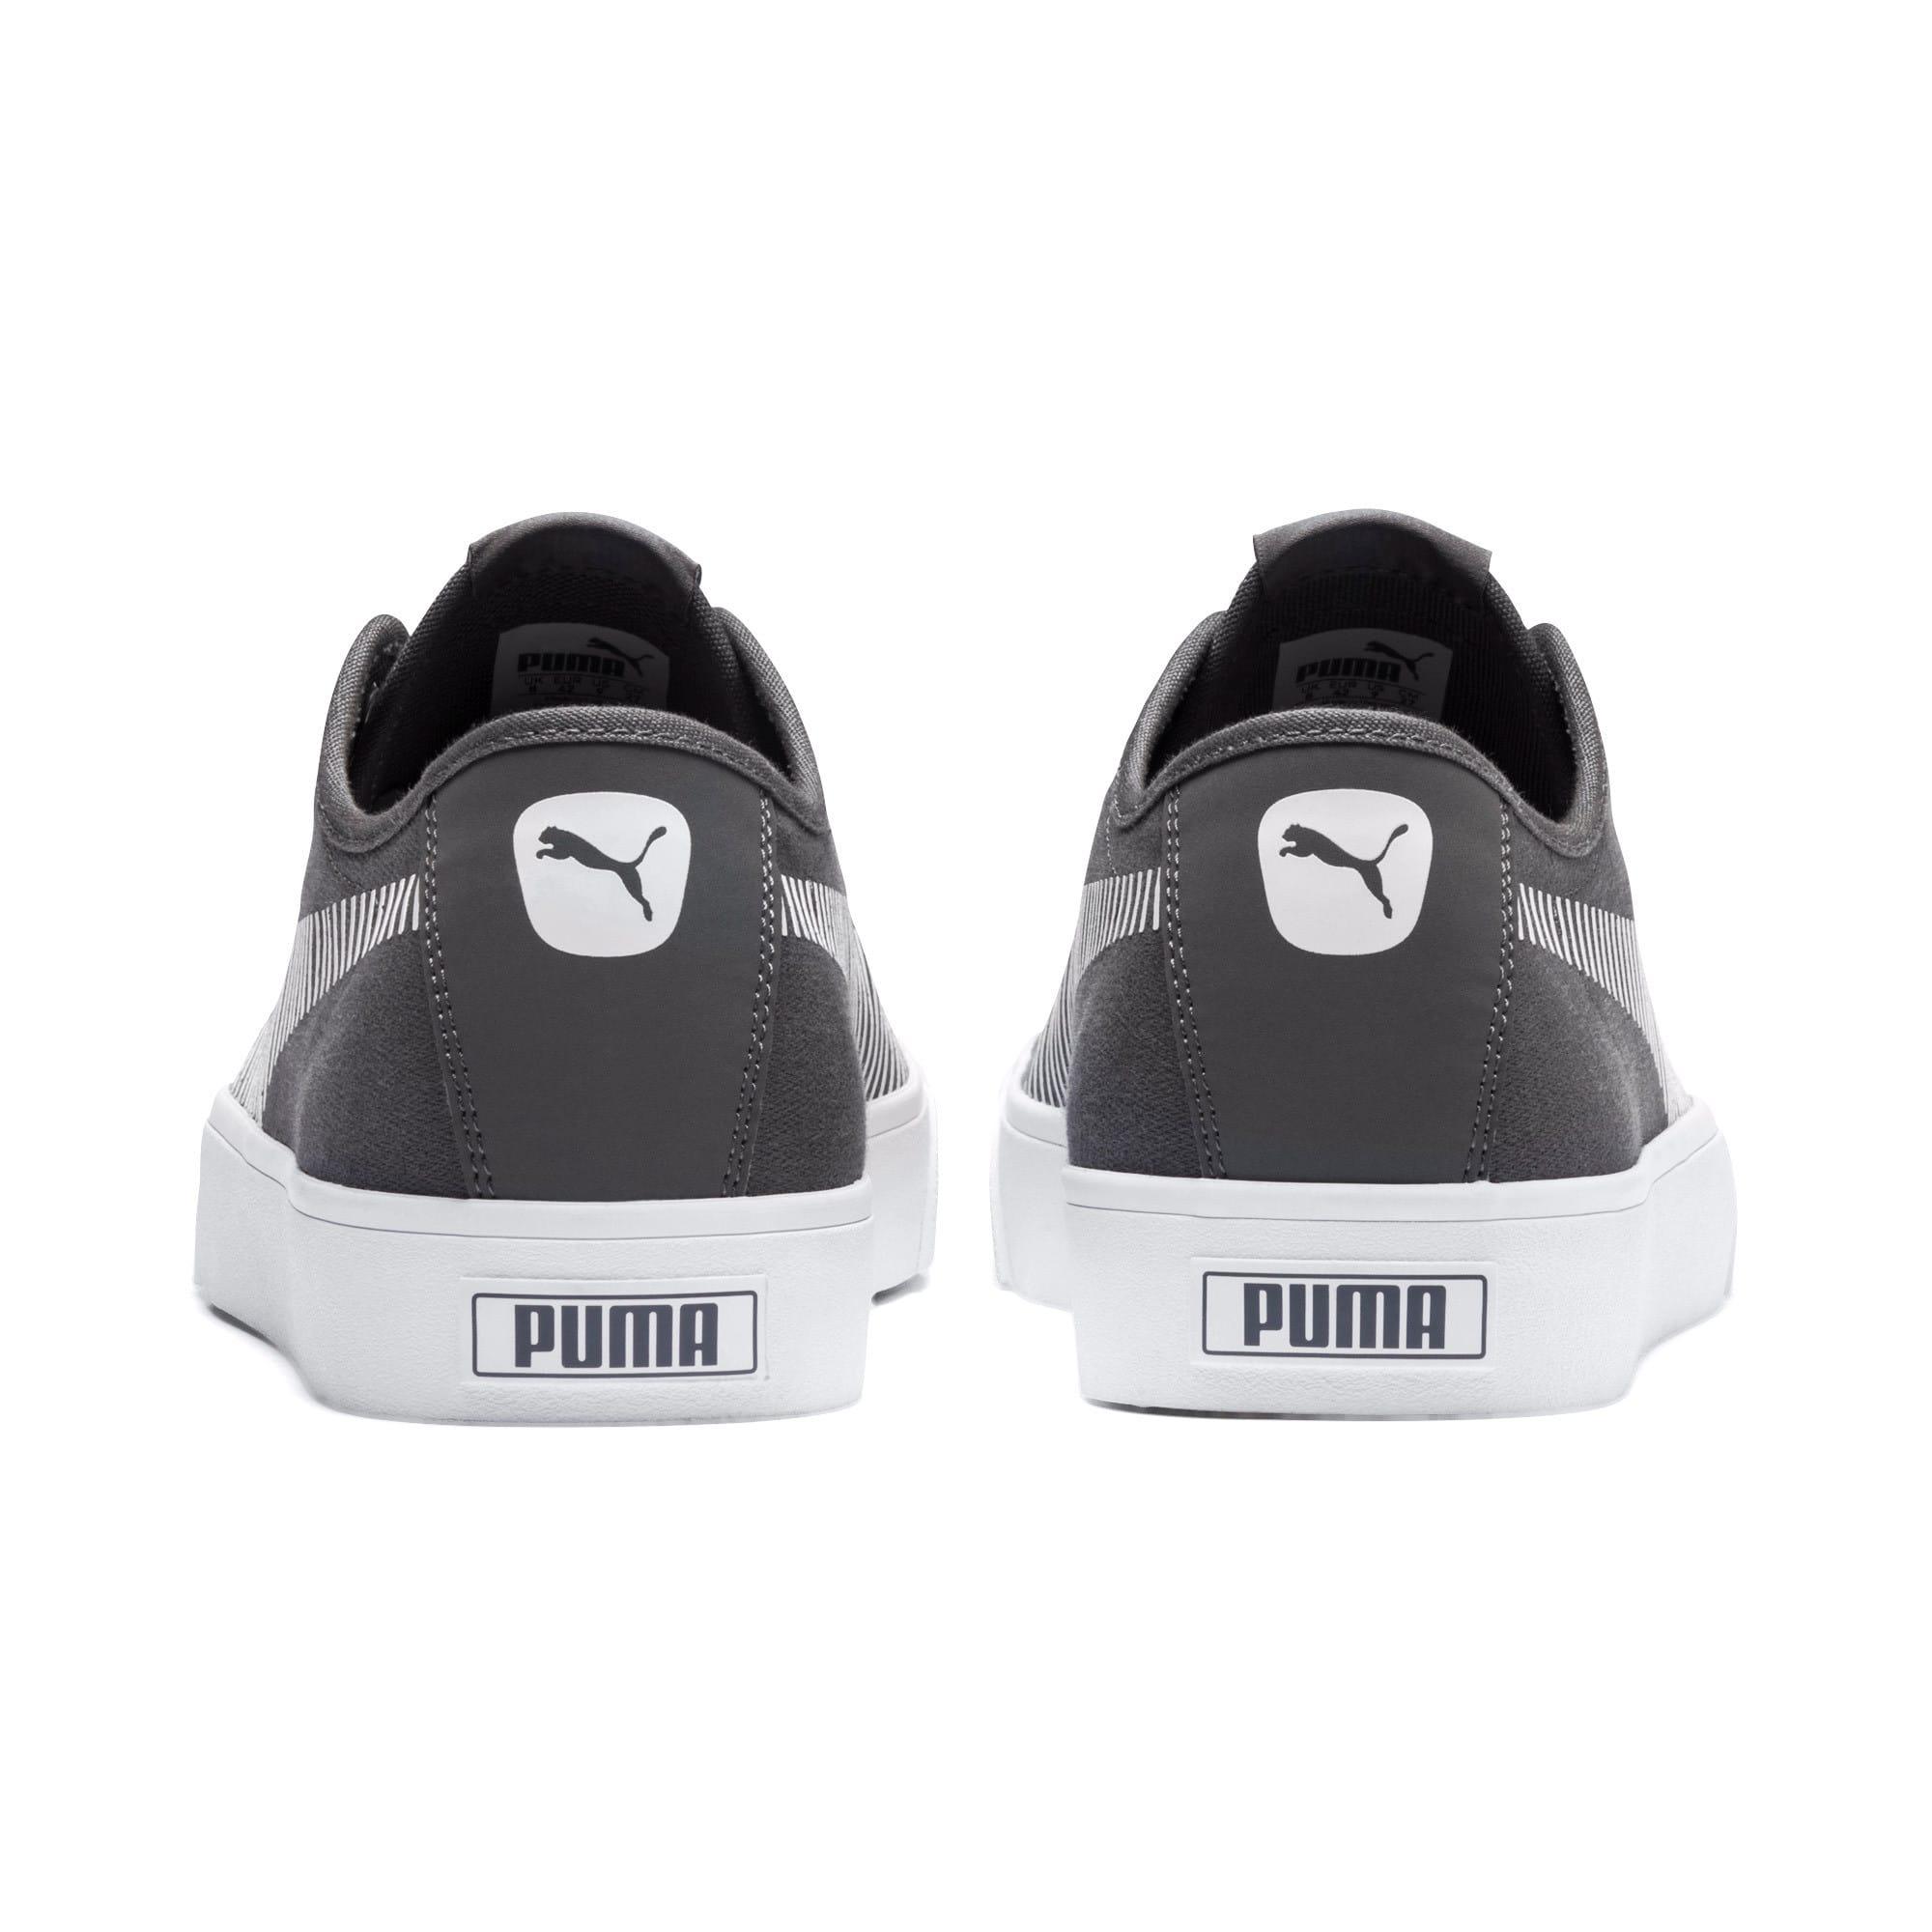 Thumbnail 4 of Bari Sneakers, Charcoal Gray-Puma White, medium